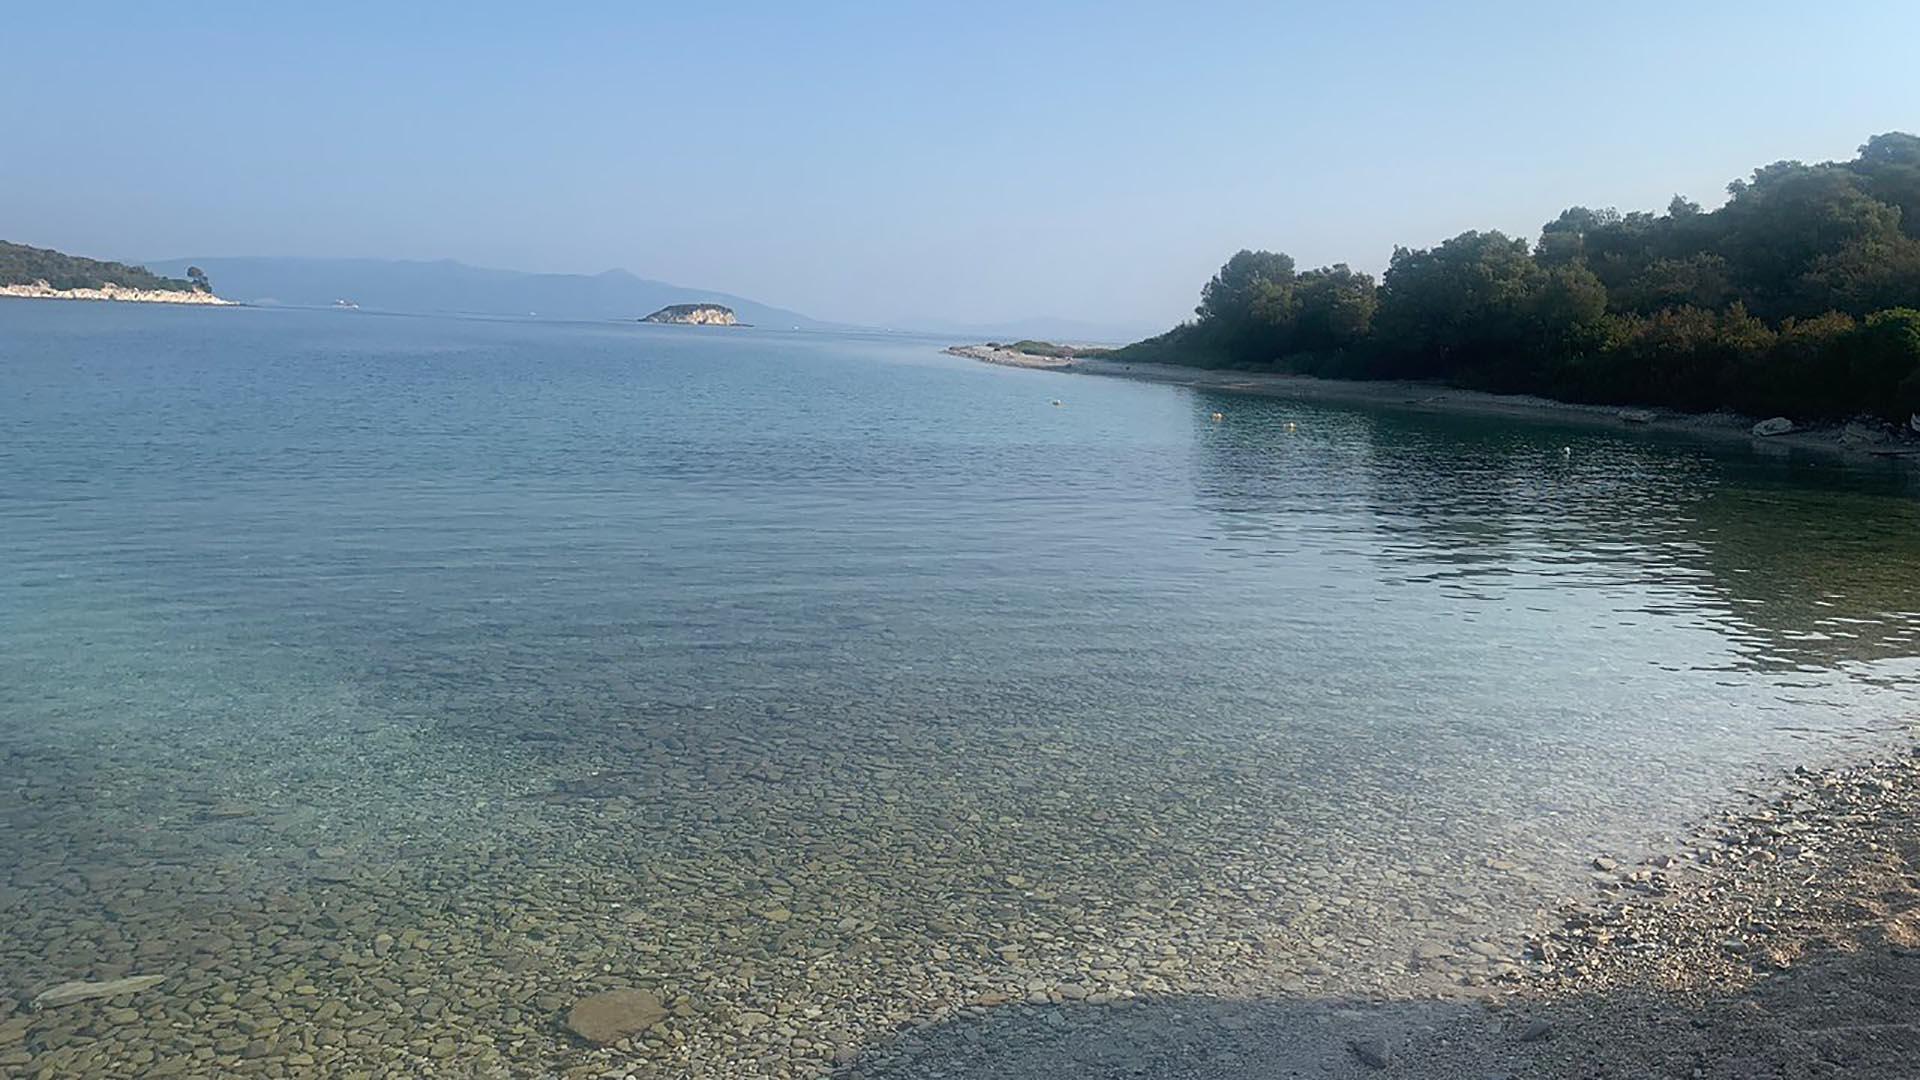 Asteria Villas & Boats Meganisi Sights